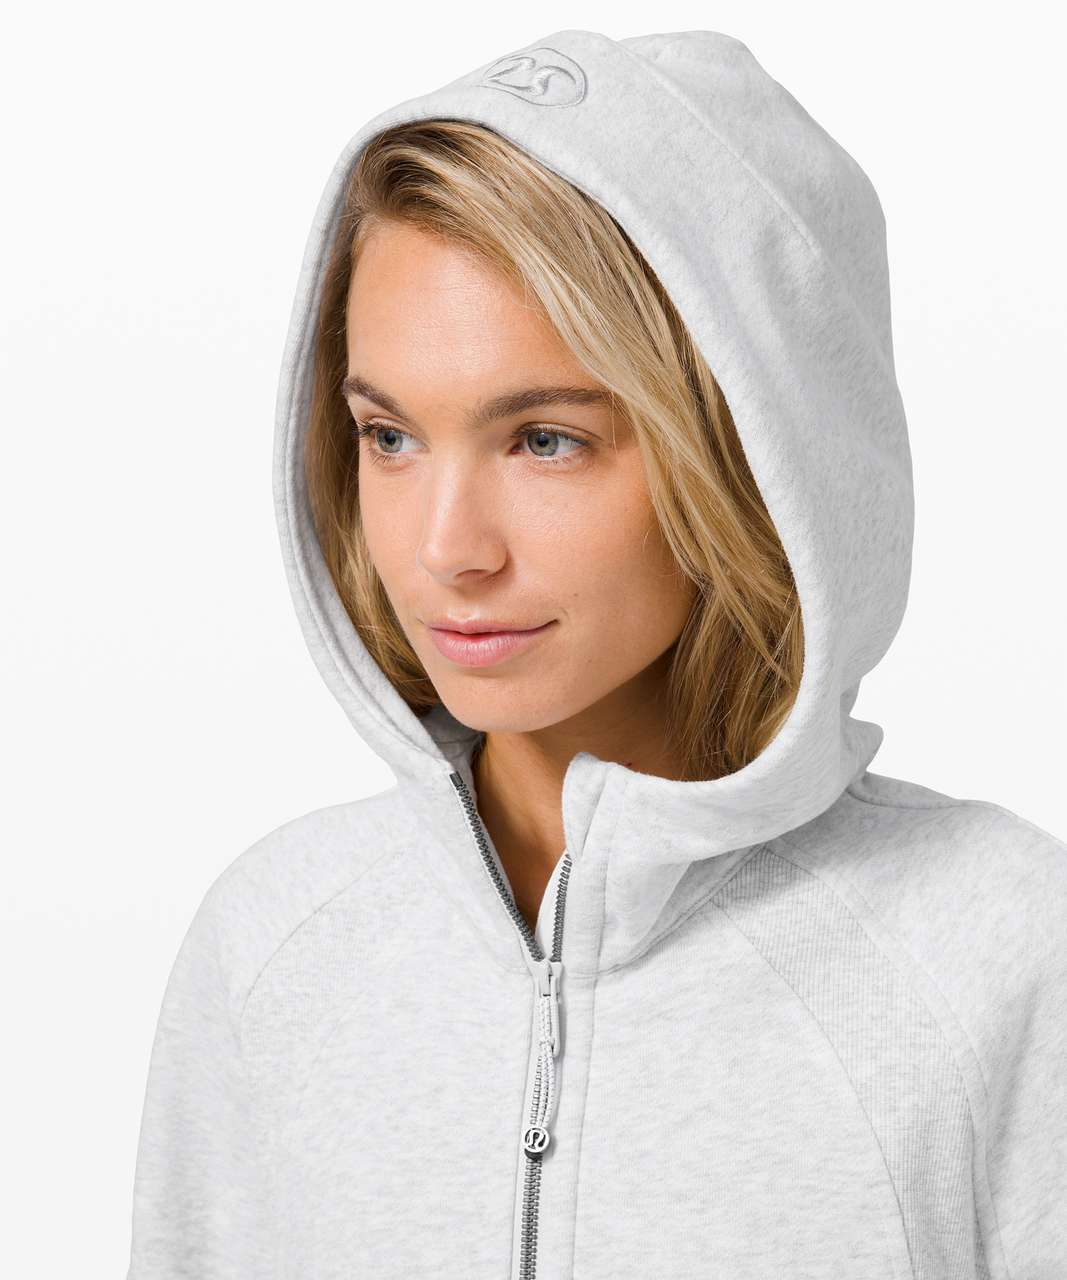 Lululemon Scuba Oversized 1/2 Zip Hoodie - Heathered Core Ultra Light Grey